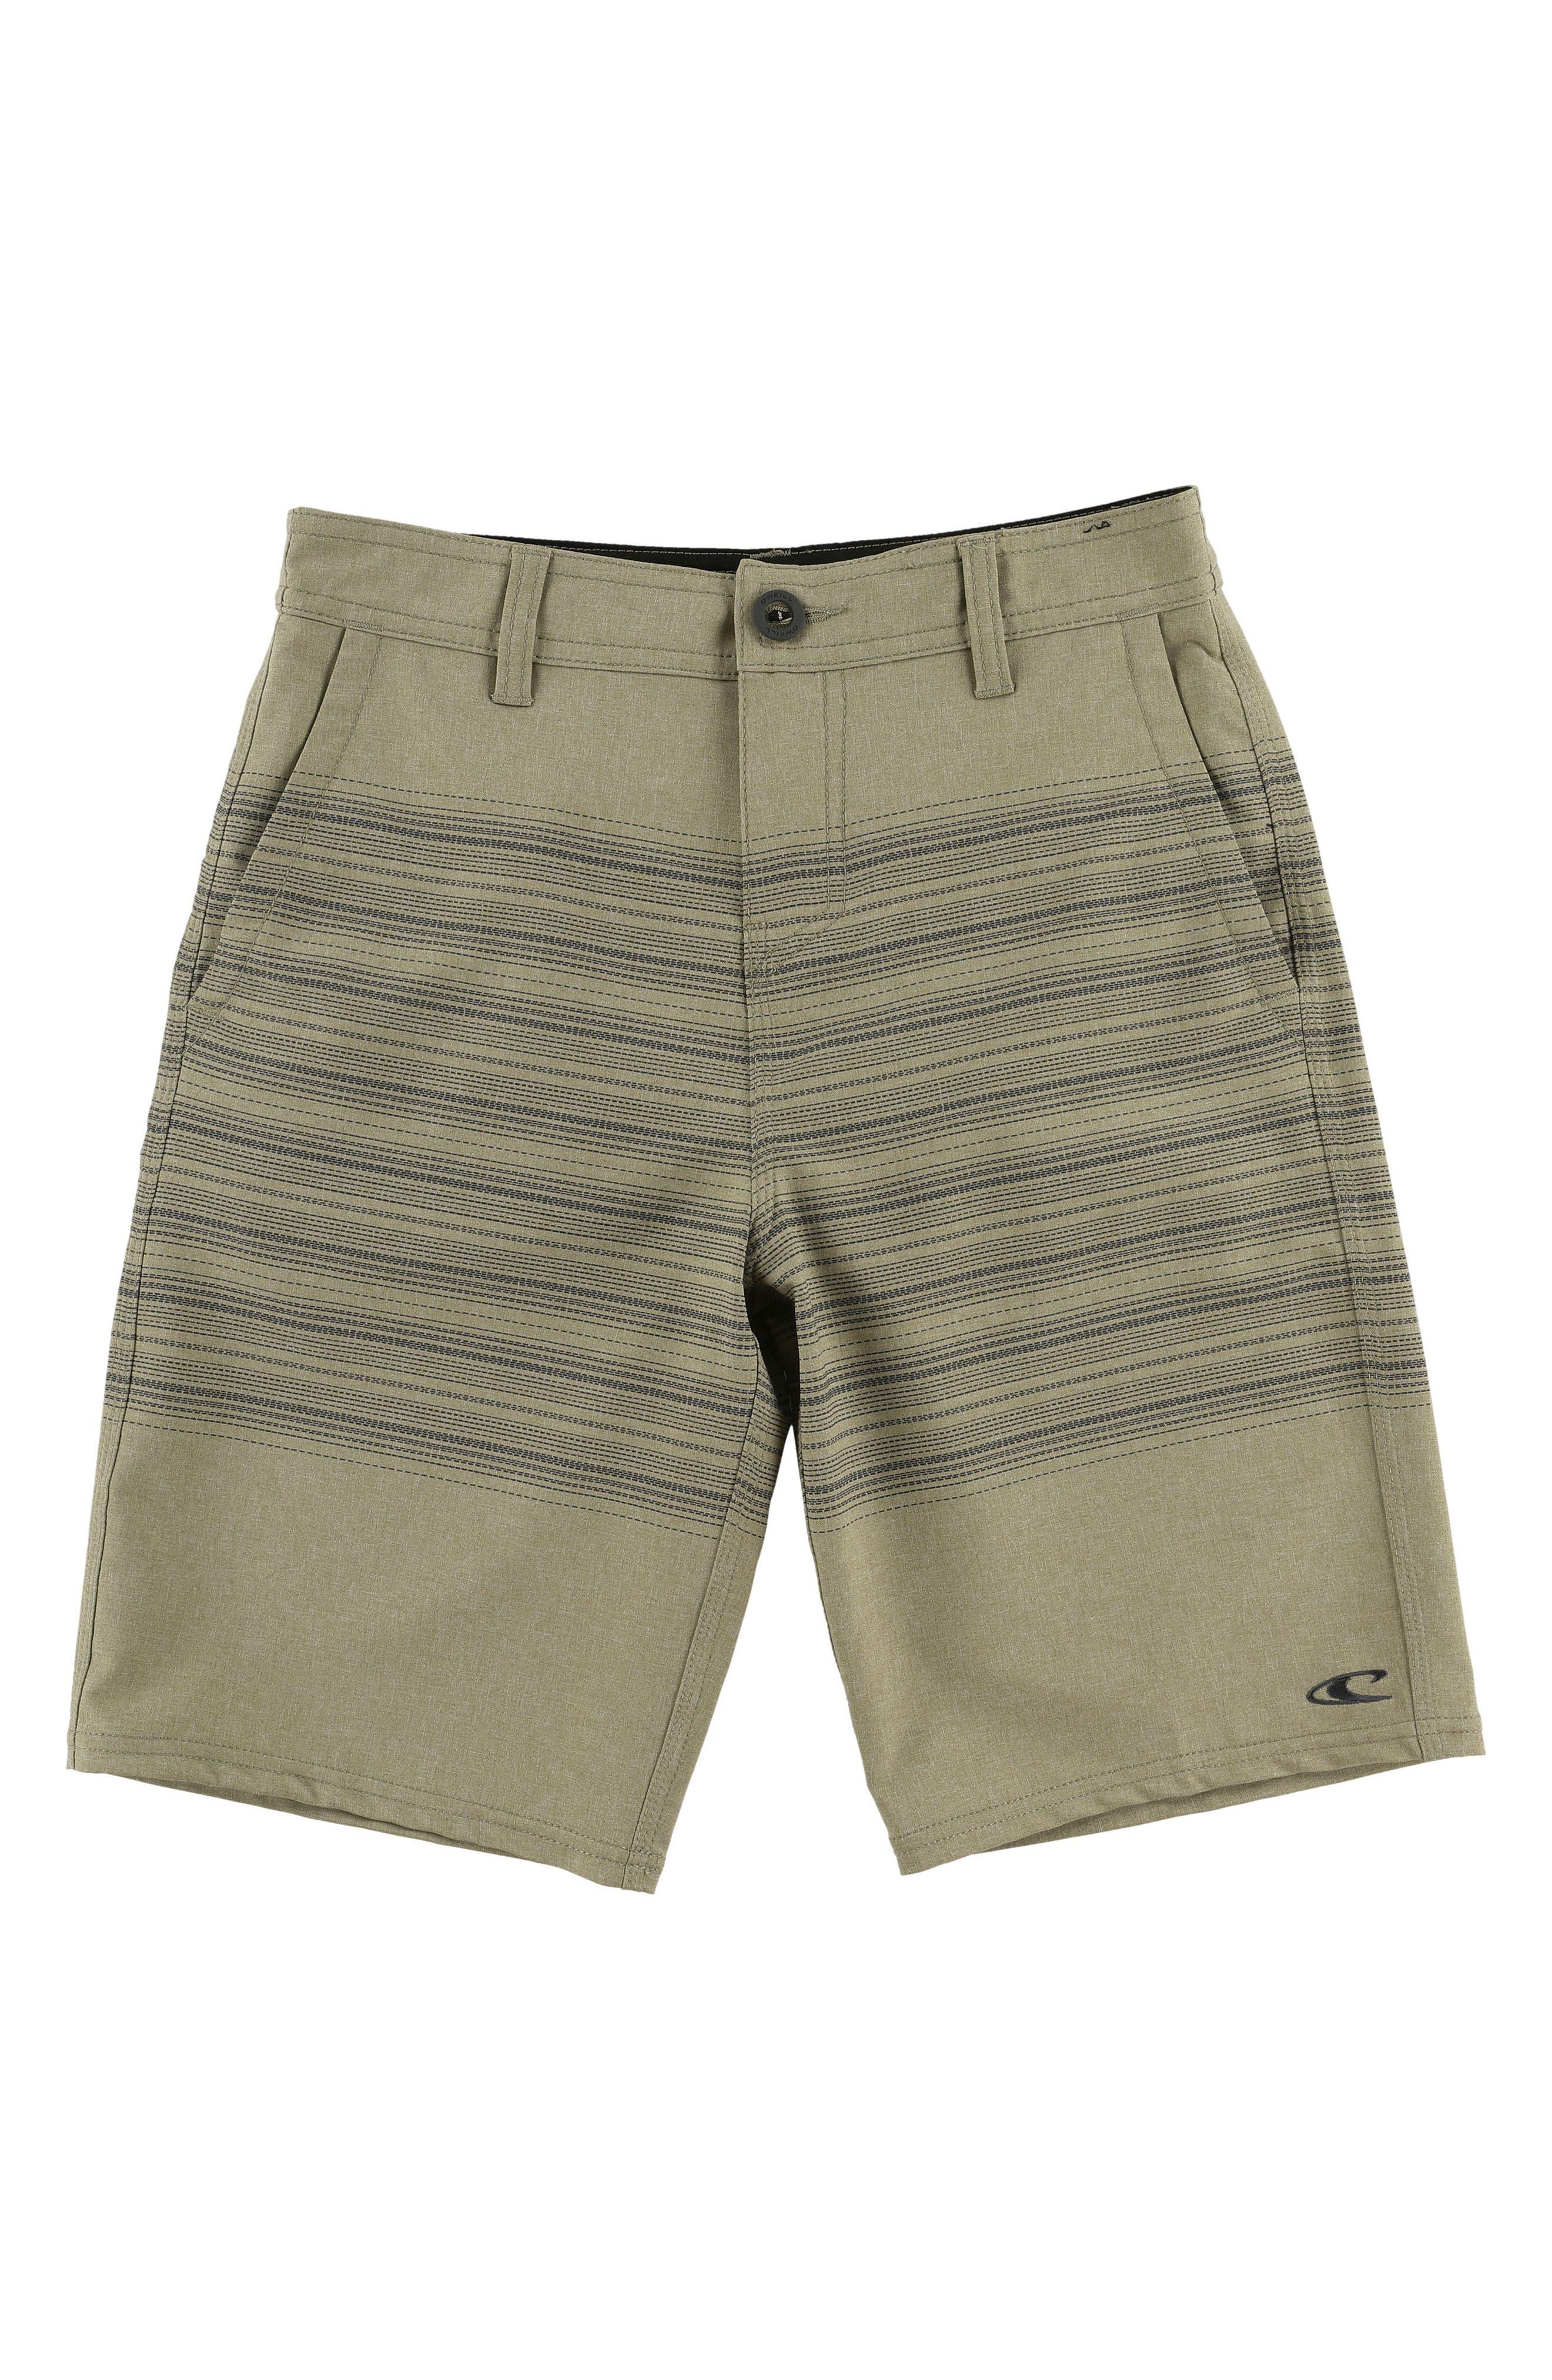 Loaded Schematic Hybrid Board Shorts,                         Main,                         color, Khaki